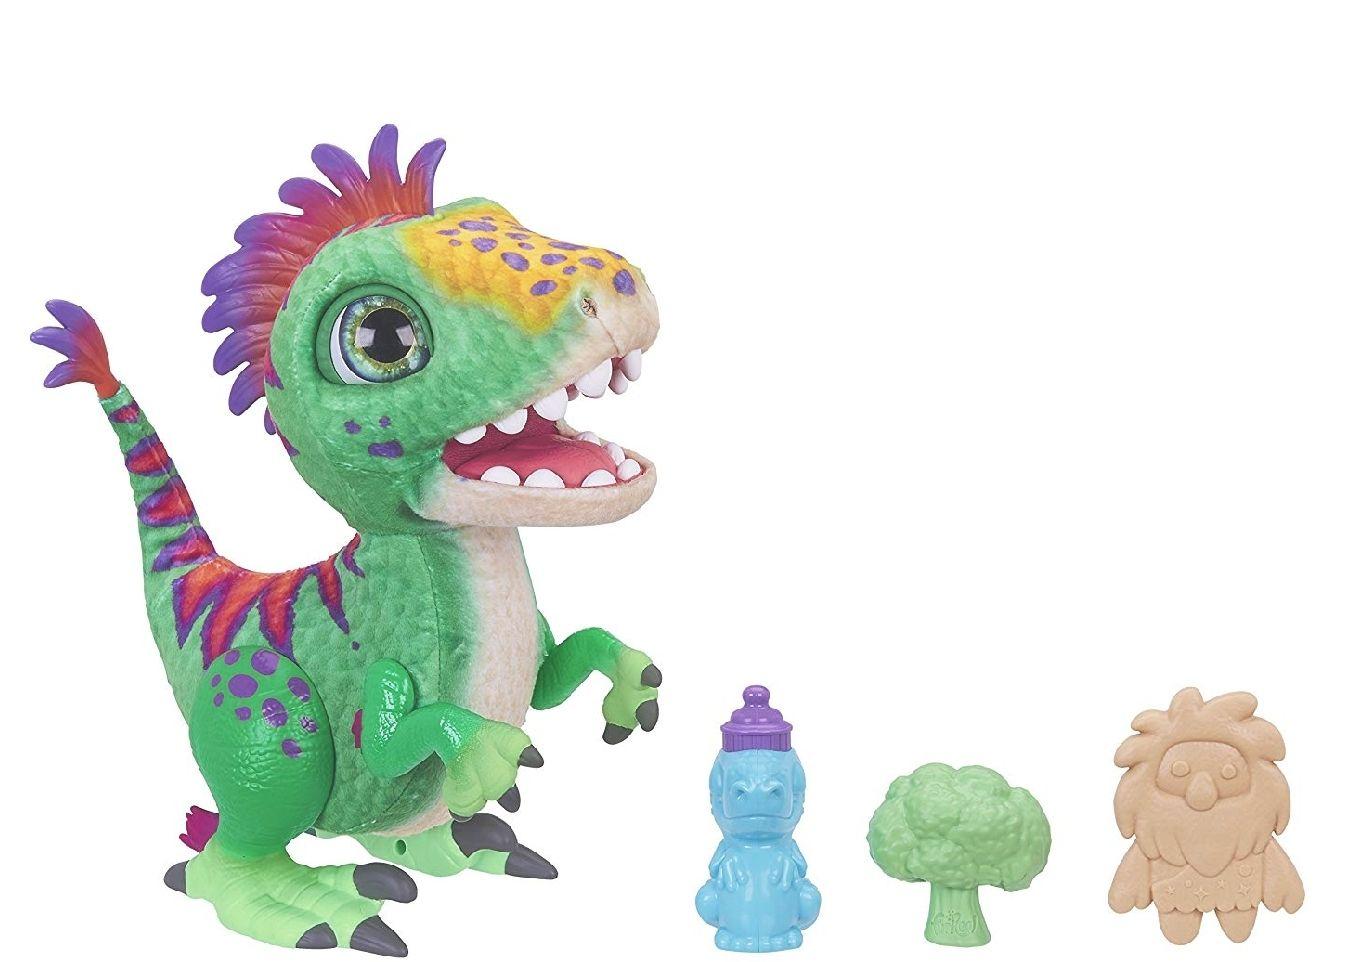 [amazon.de] Hasbro FurReal Mampfosaurus Rex